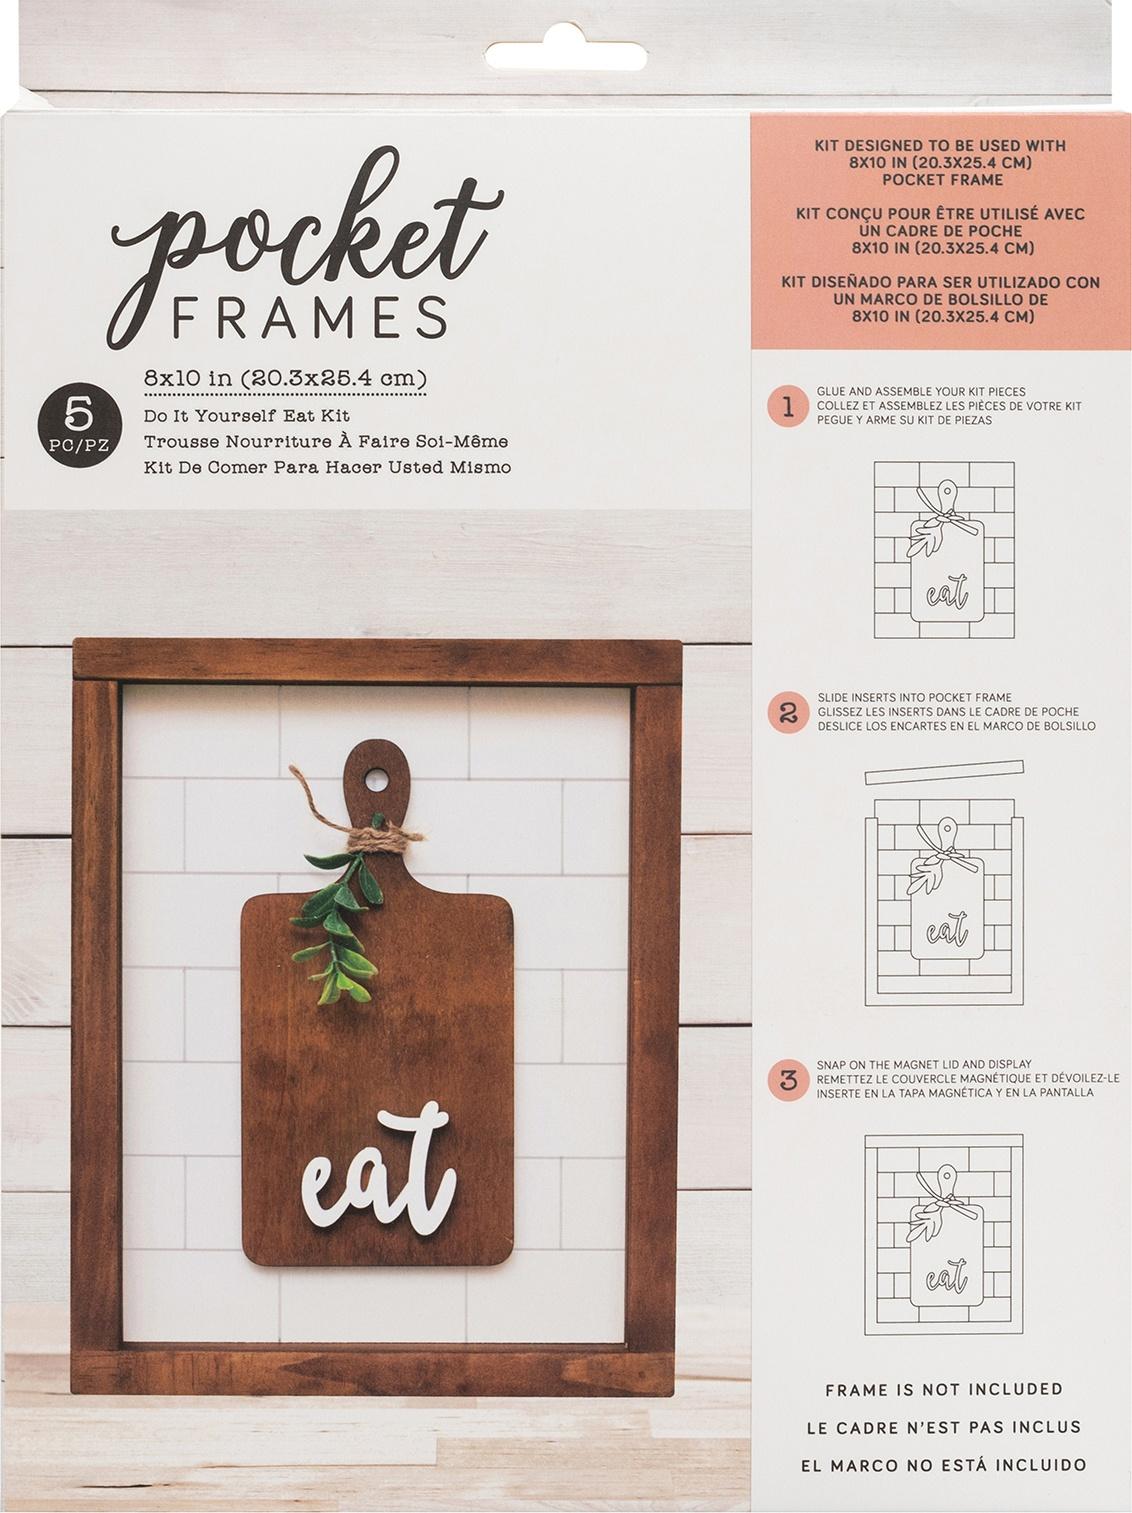 American Crafts Pocket Frames Insert Kit 8X10 5/Pkg-Eat W/Insert